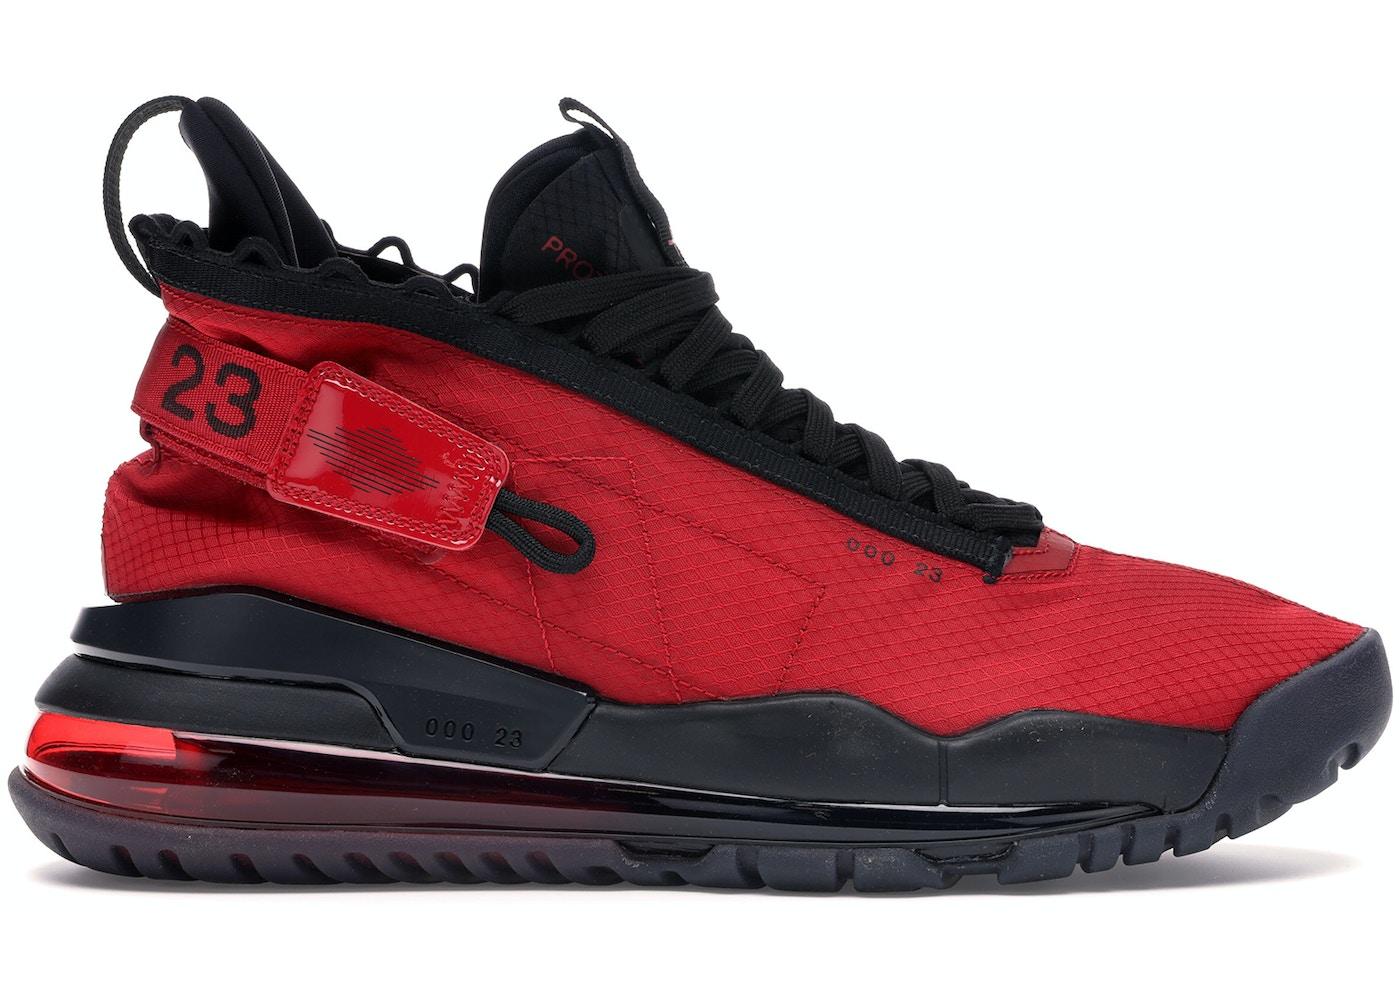 d26aad7d671 Buy Air Jordan Other Shoes & Deadstock Sneakers